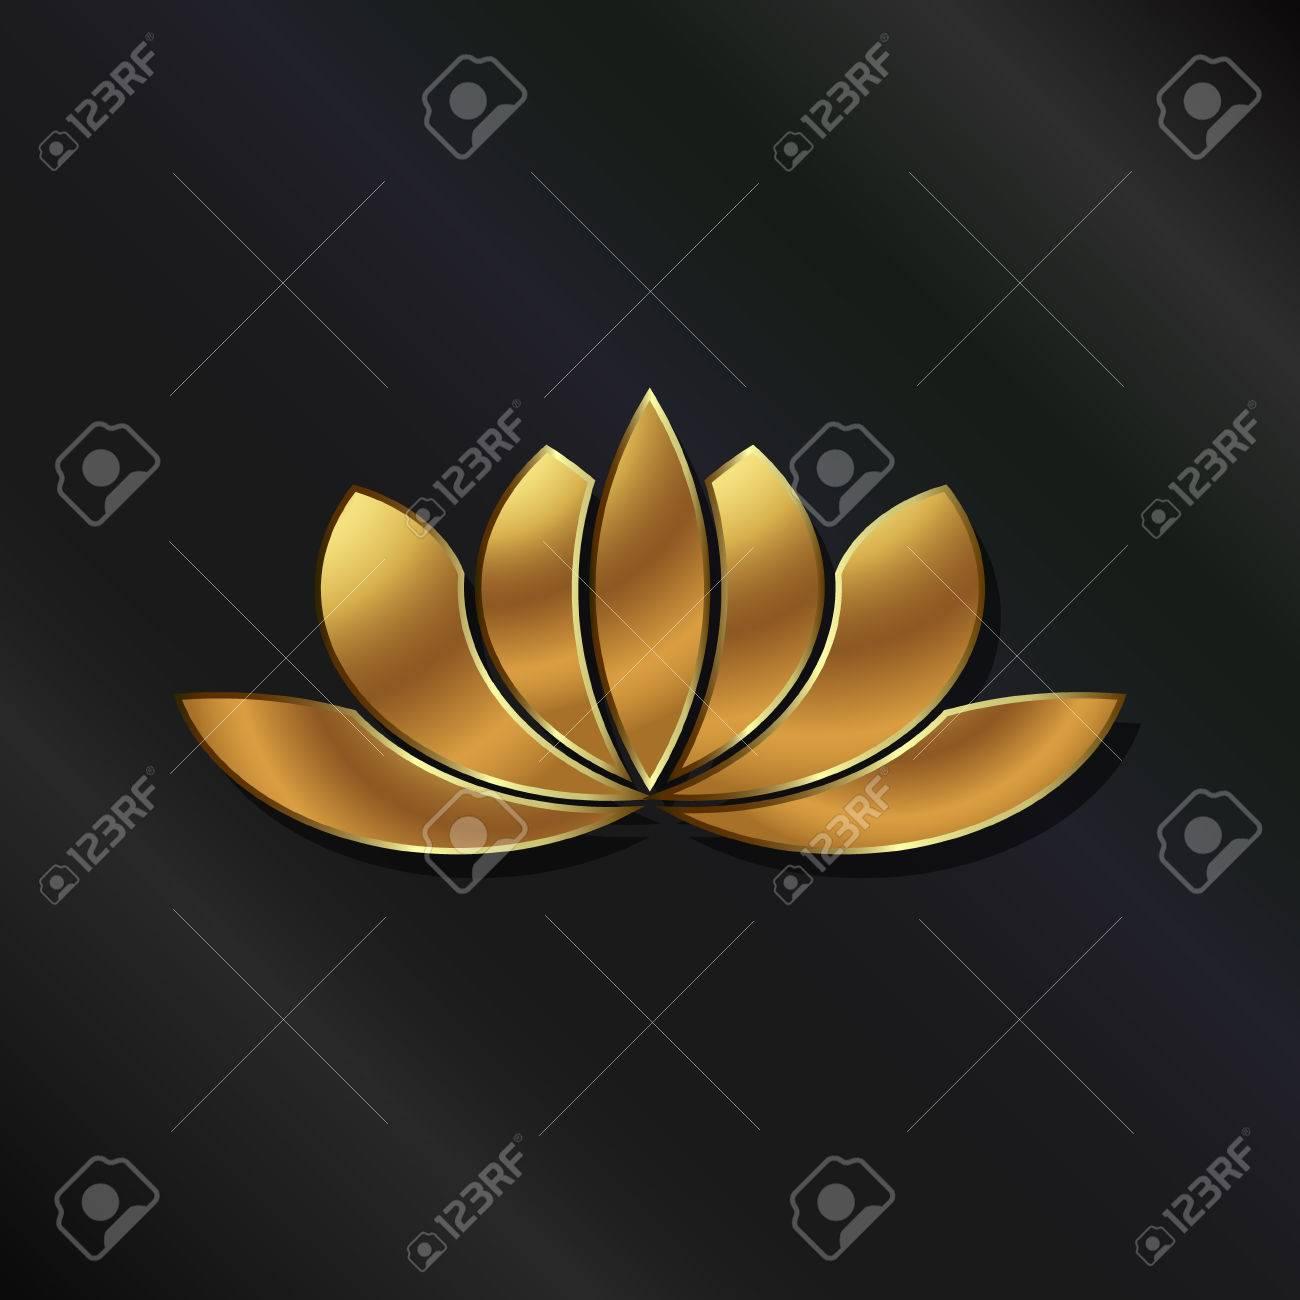 Luxury Gold Lotus plant image - 33499139